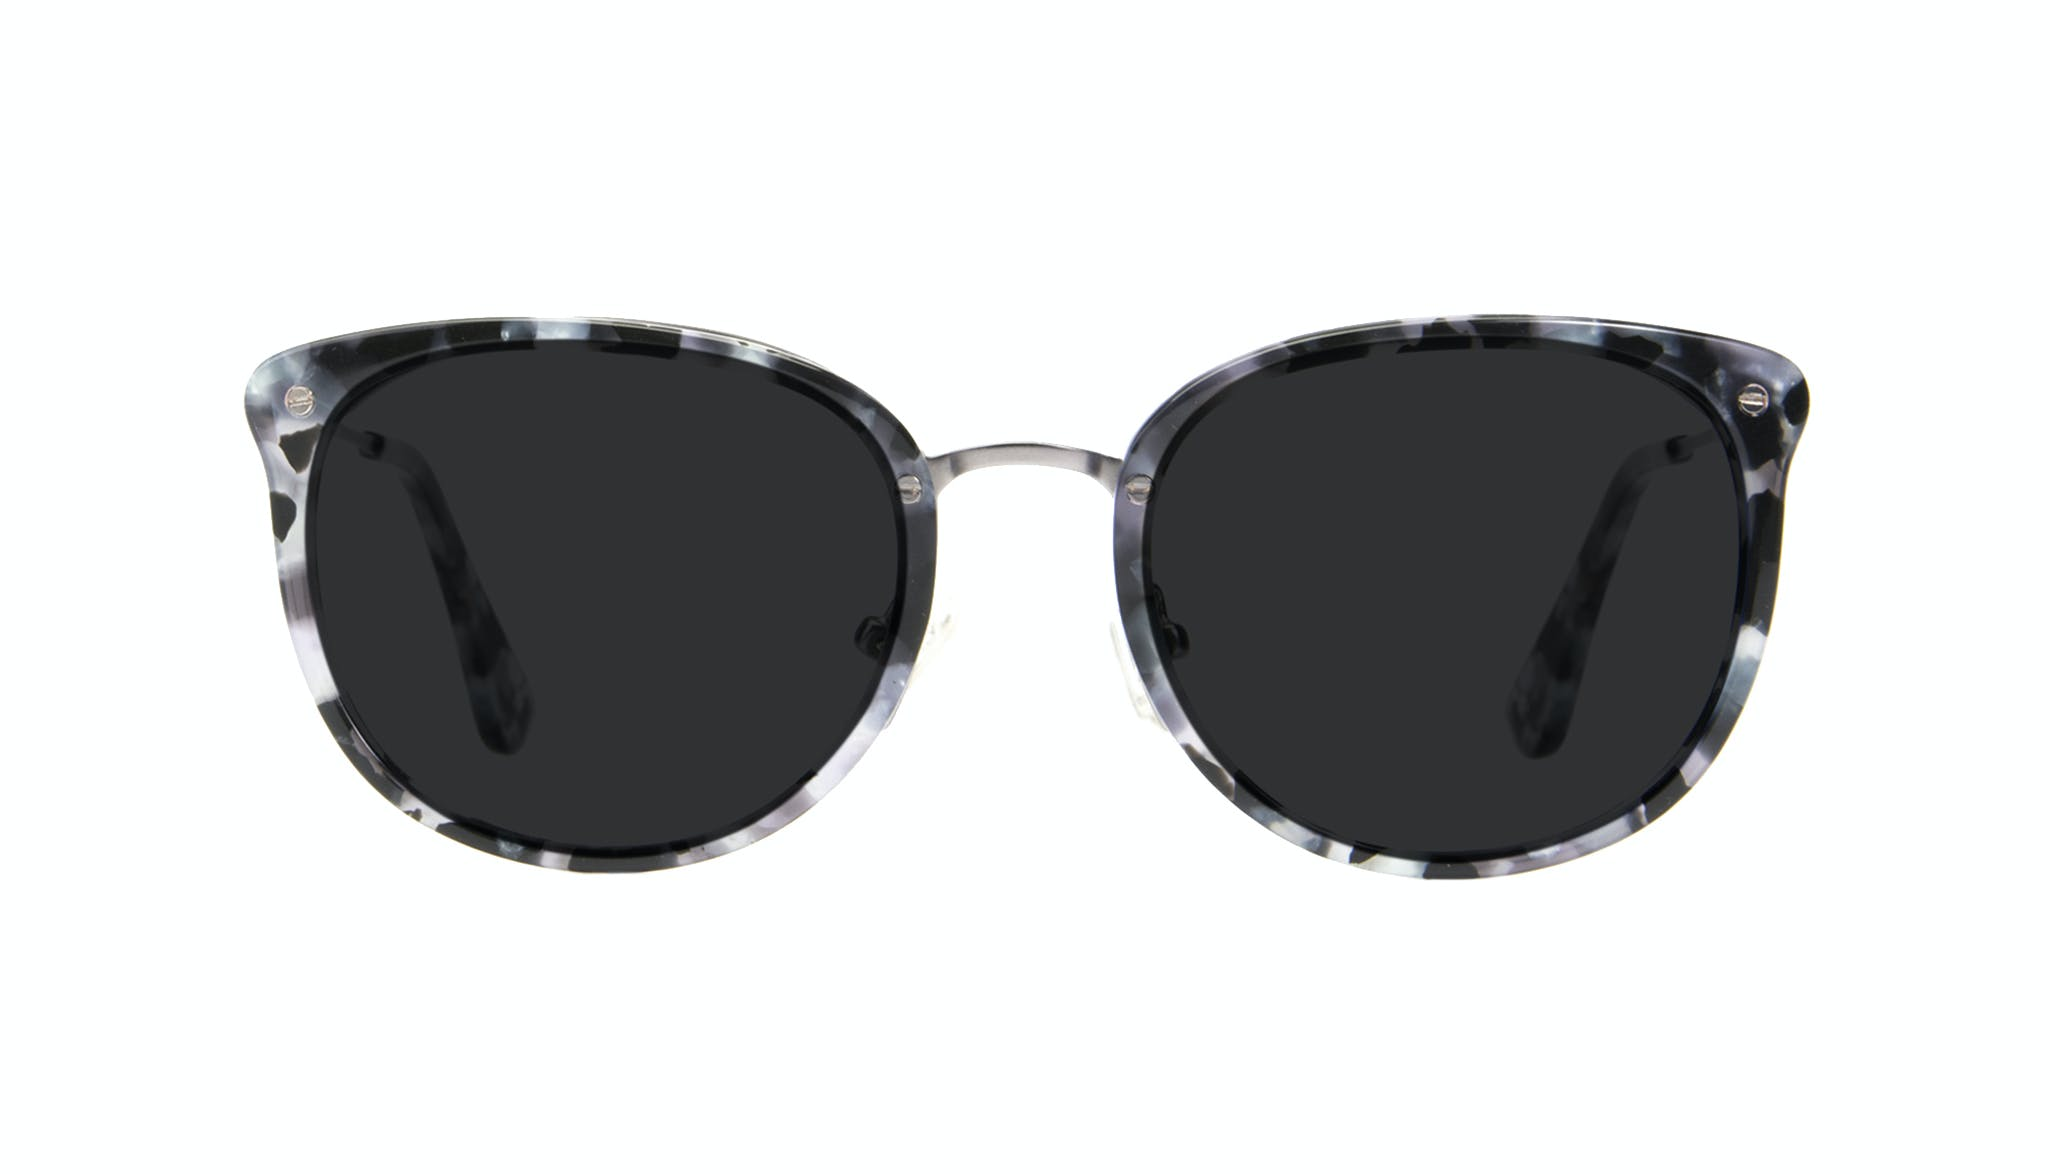 Affordable Fashion Glasses Square Round Sunglasses Women Amaze Silver Flake Front